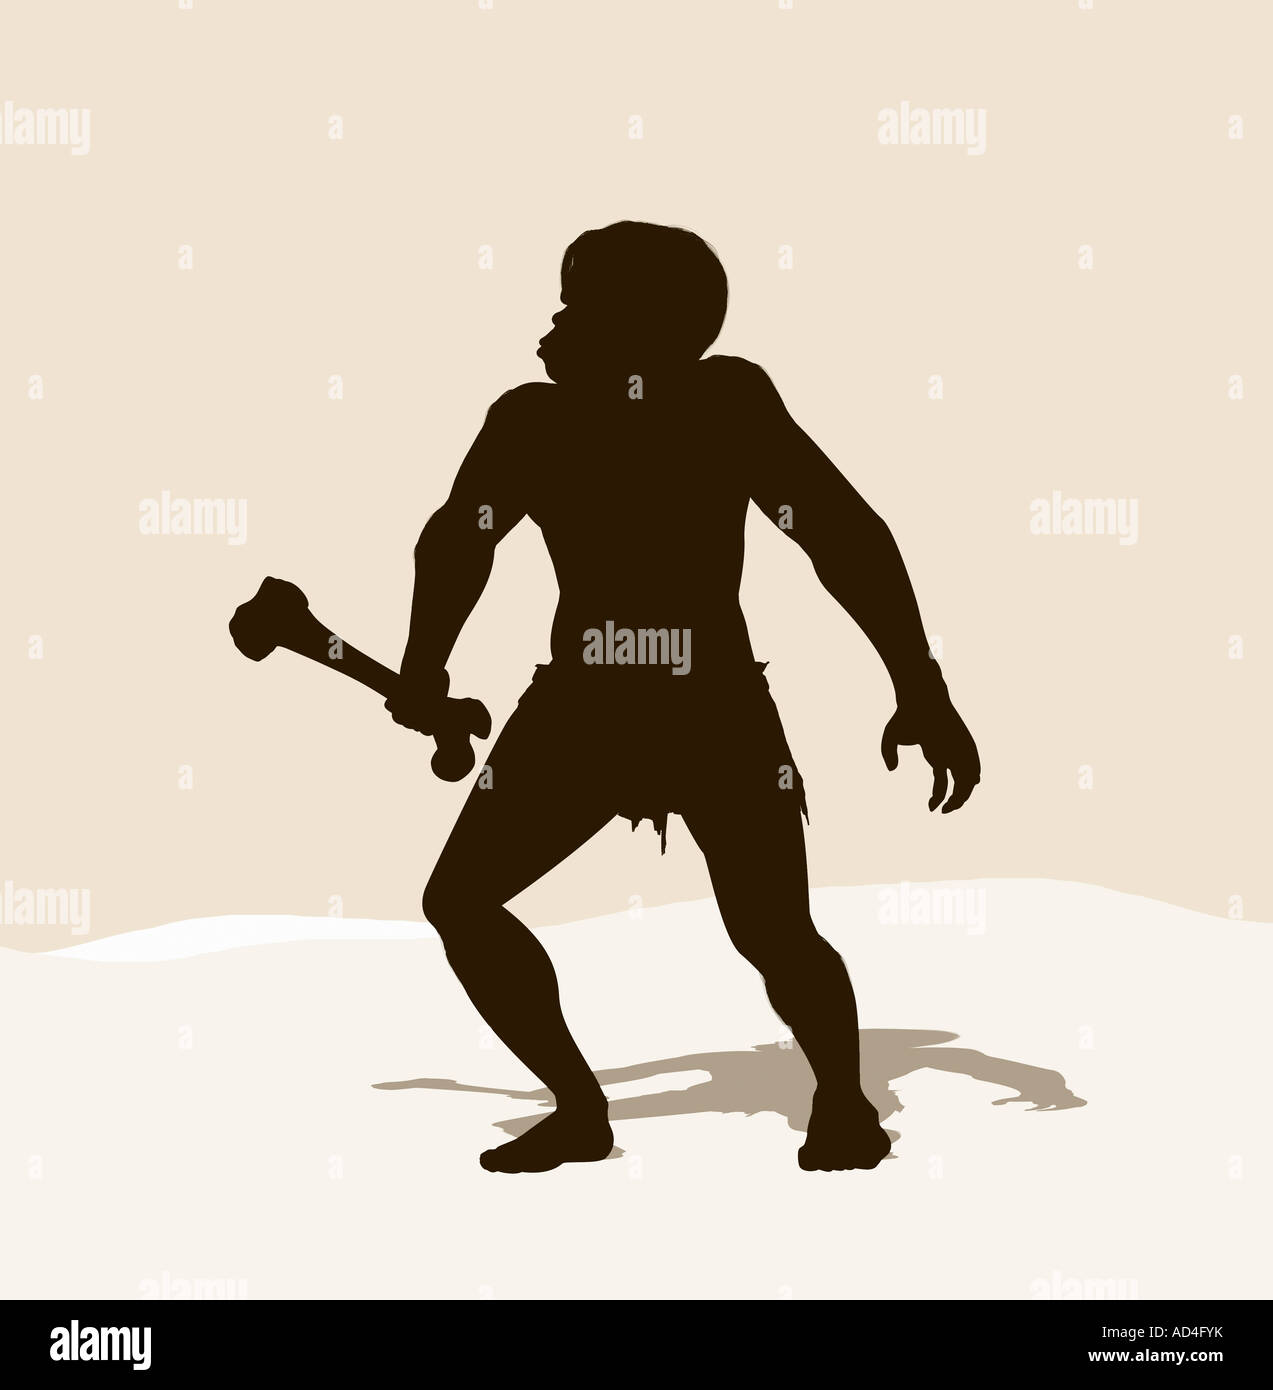 A caveman holding a bone - Stock Image